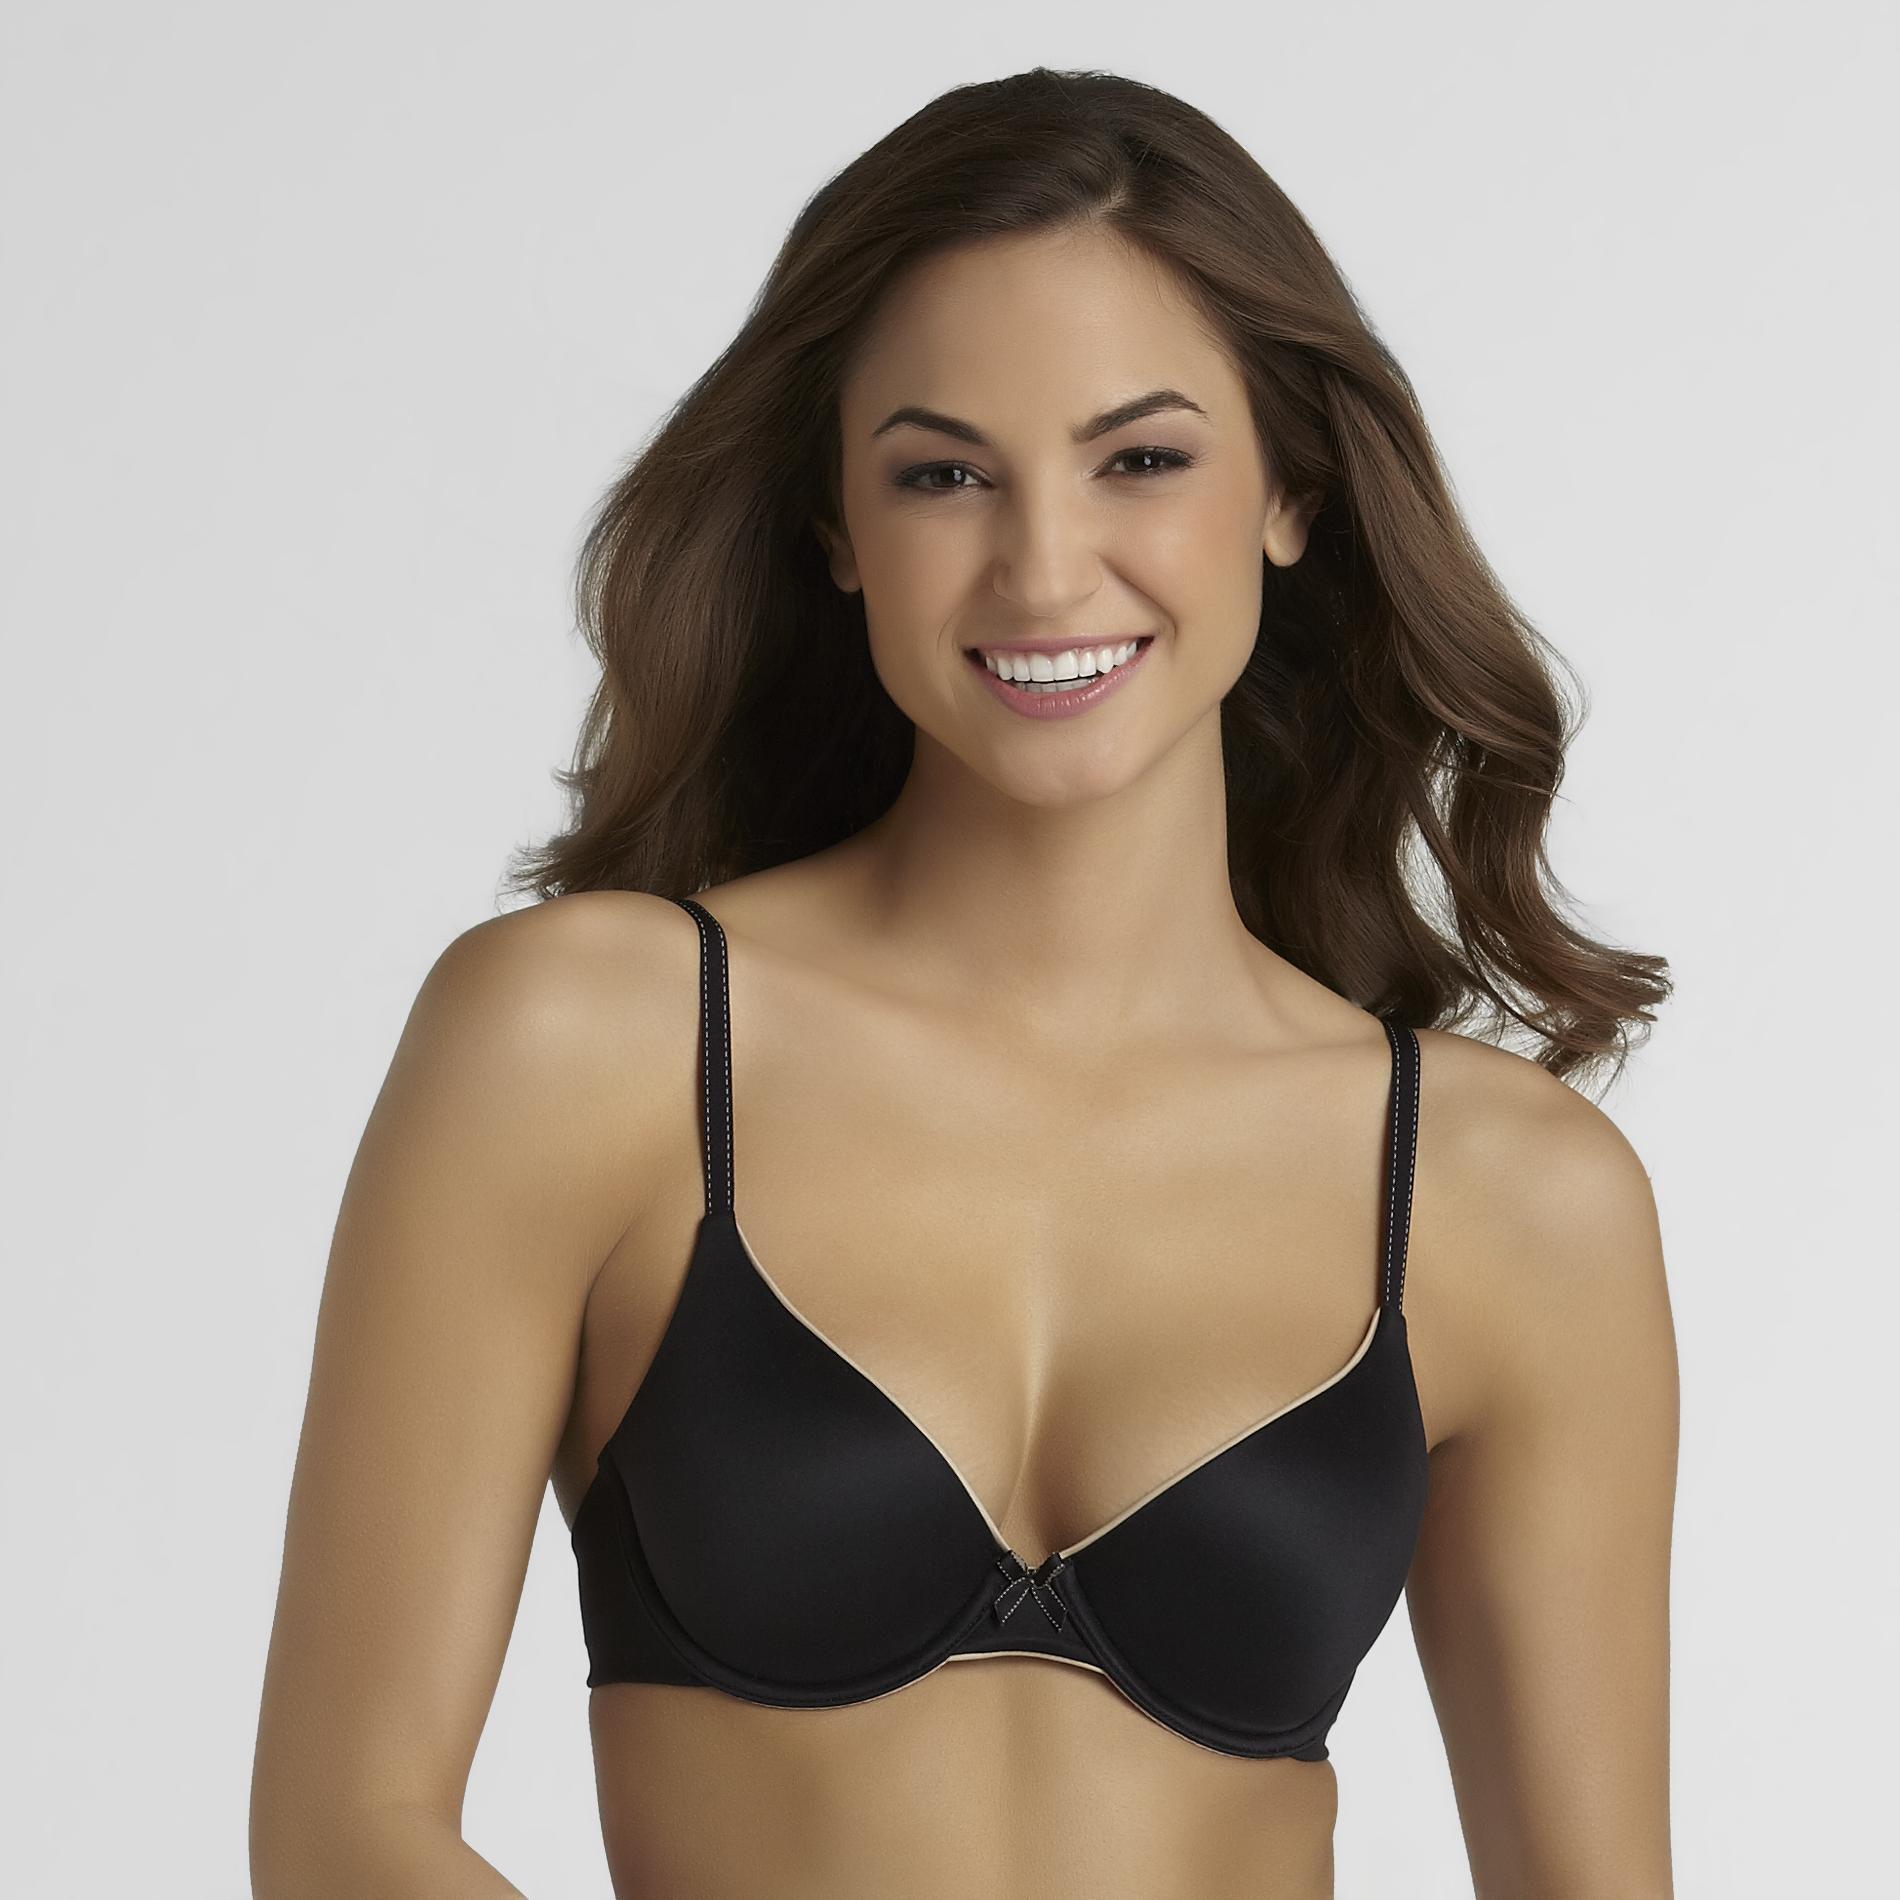 maidenform bras maidenform womenu0027s comfort devotion demi bra - 09402 oxelspv